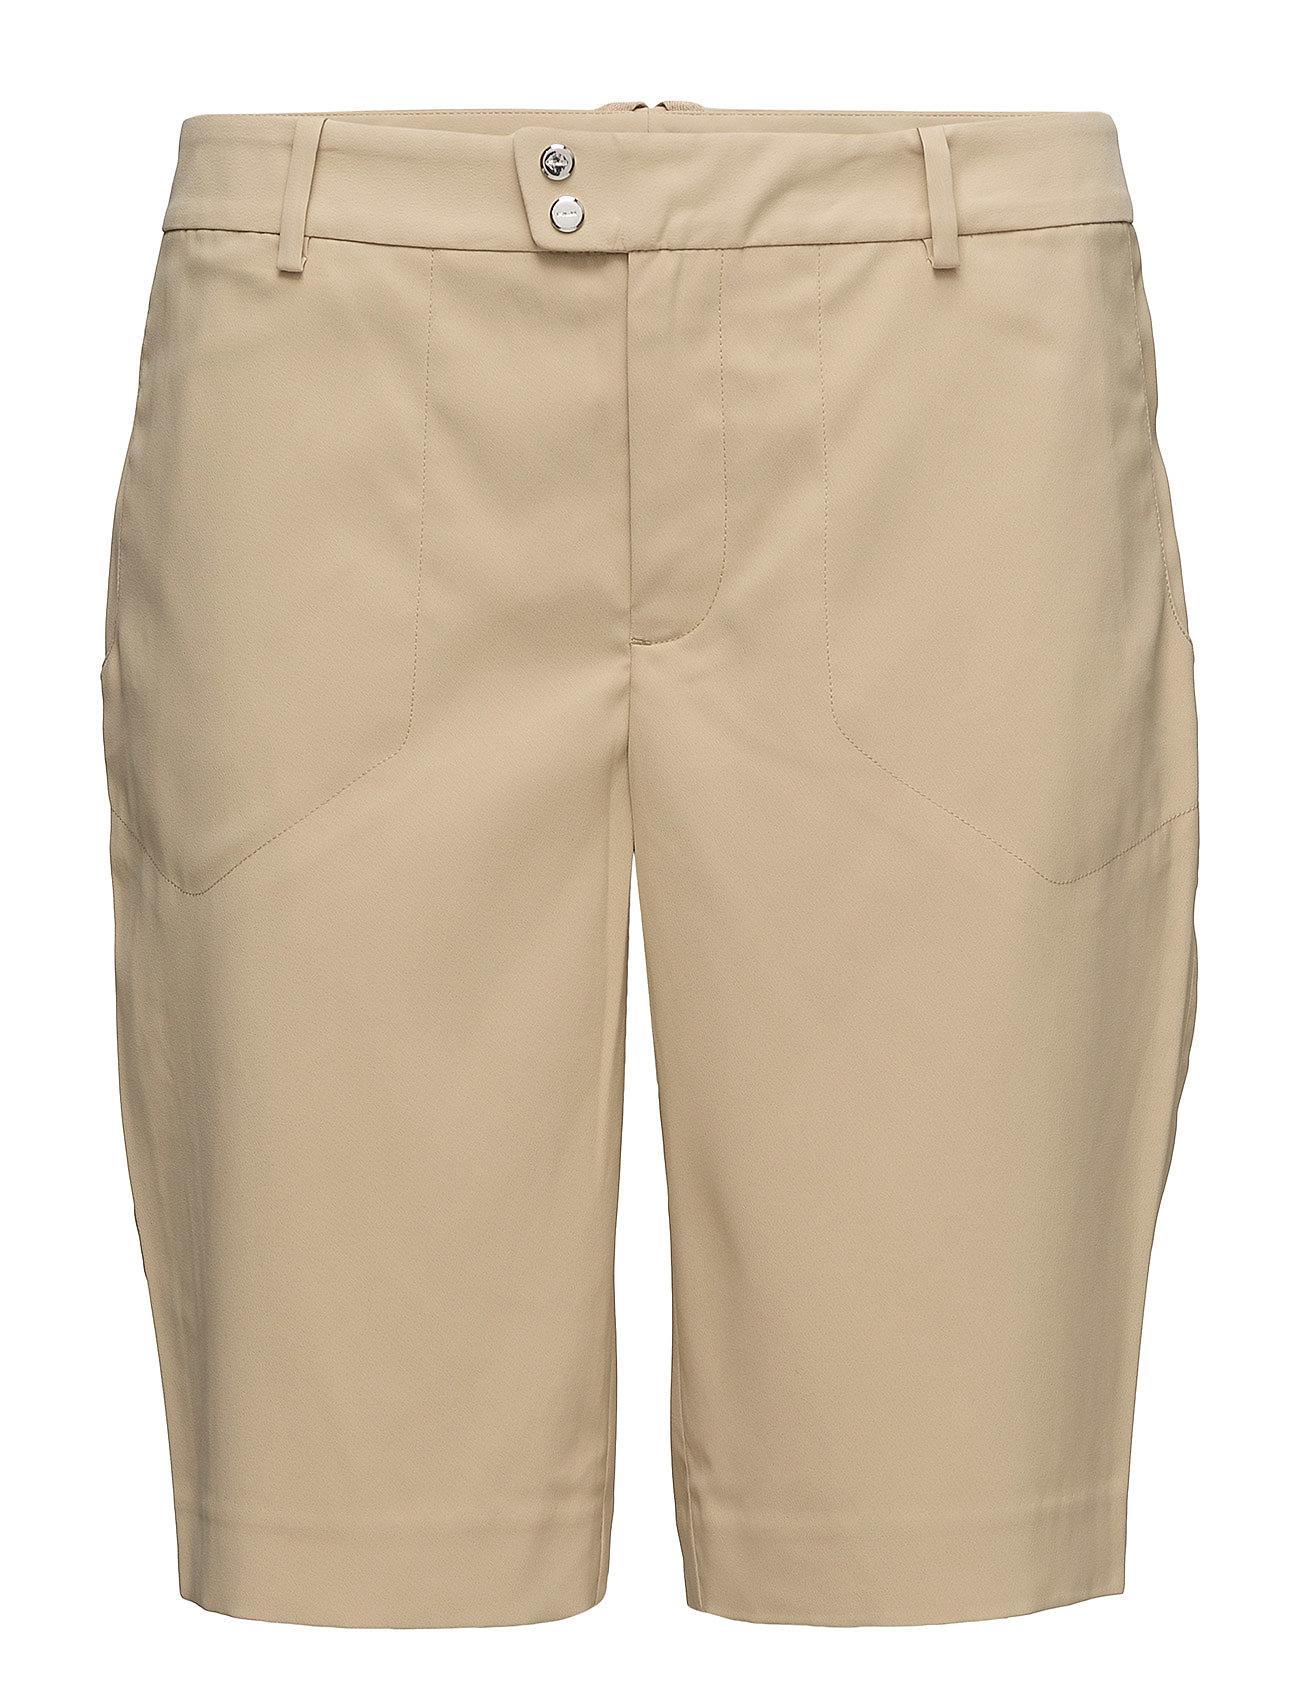 Ralph Lauren Golf Stretch Satin Short - POLO TAN